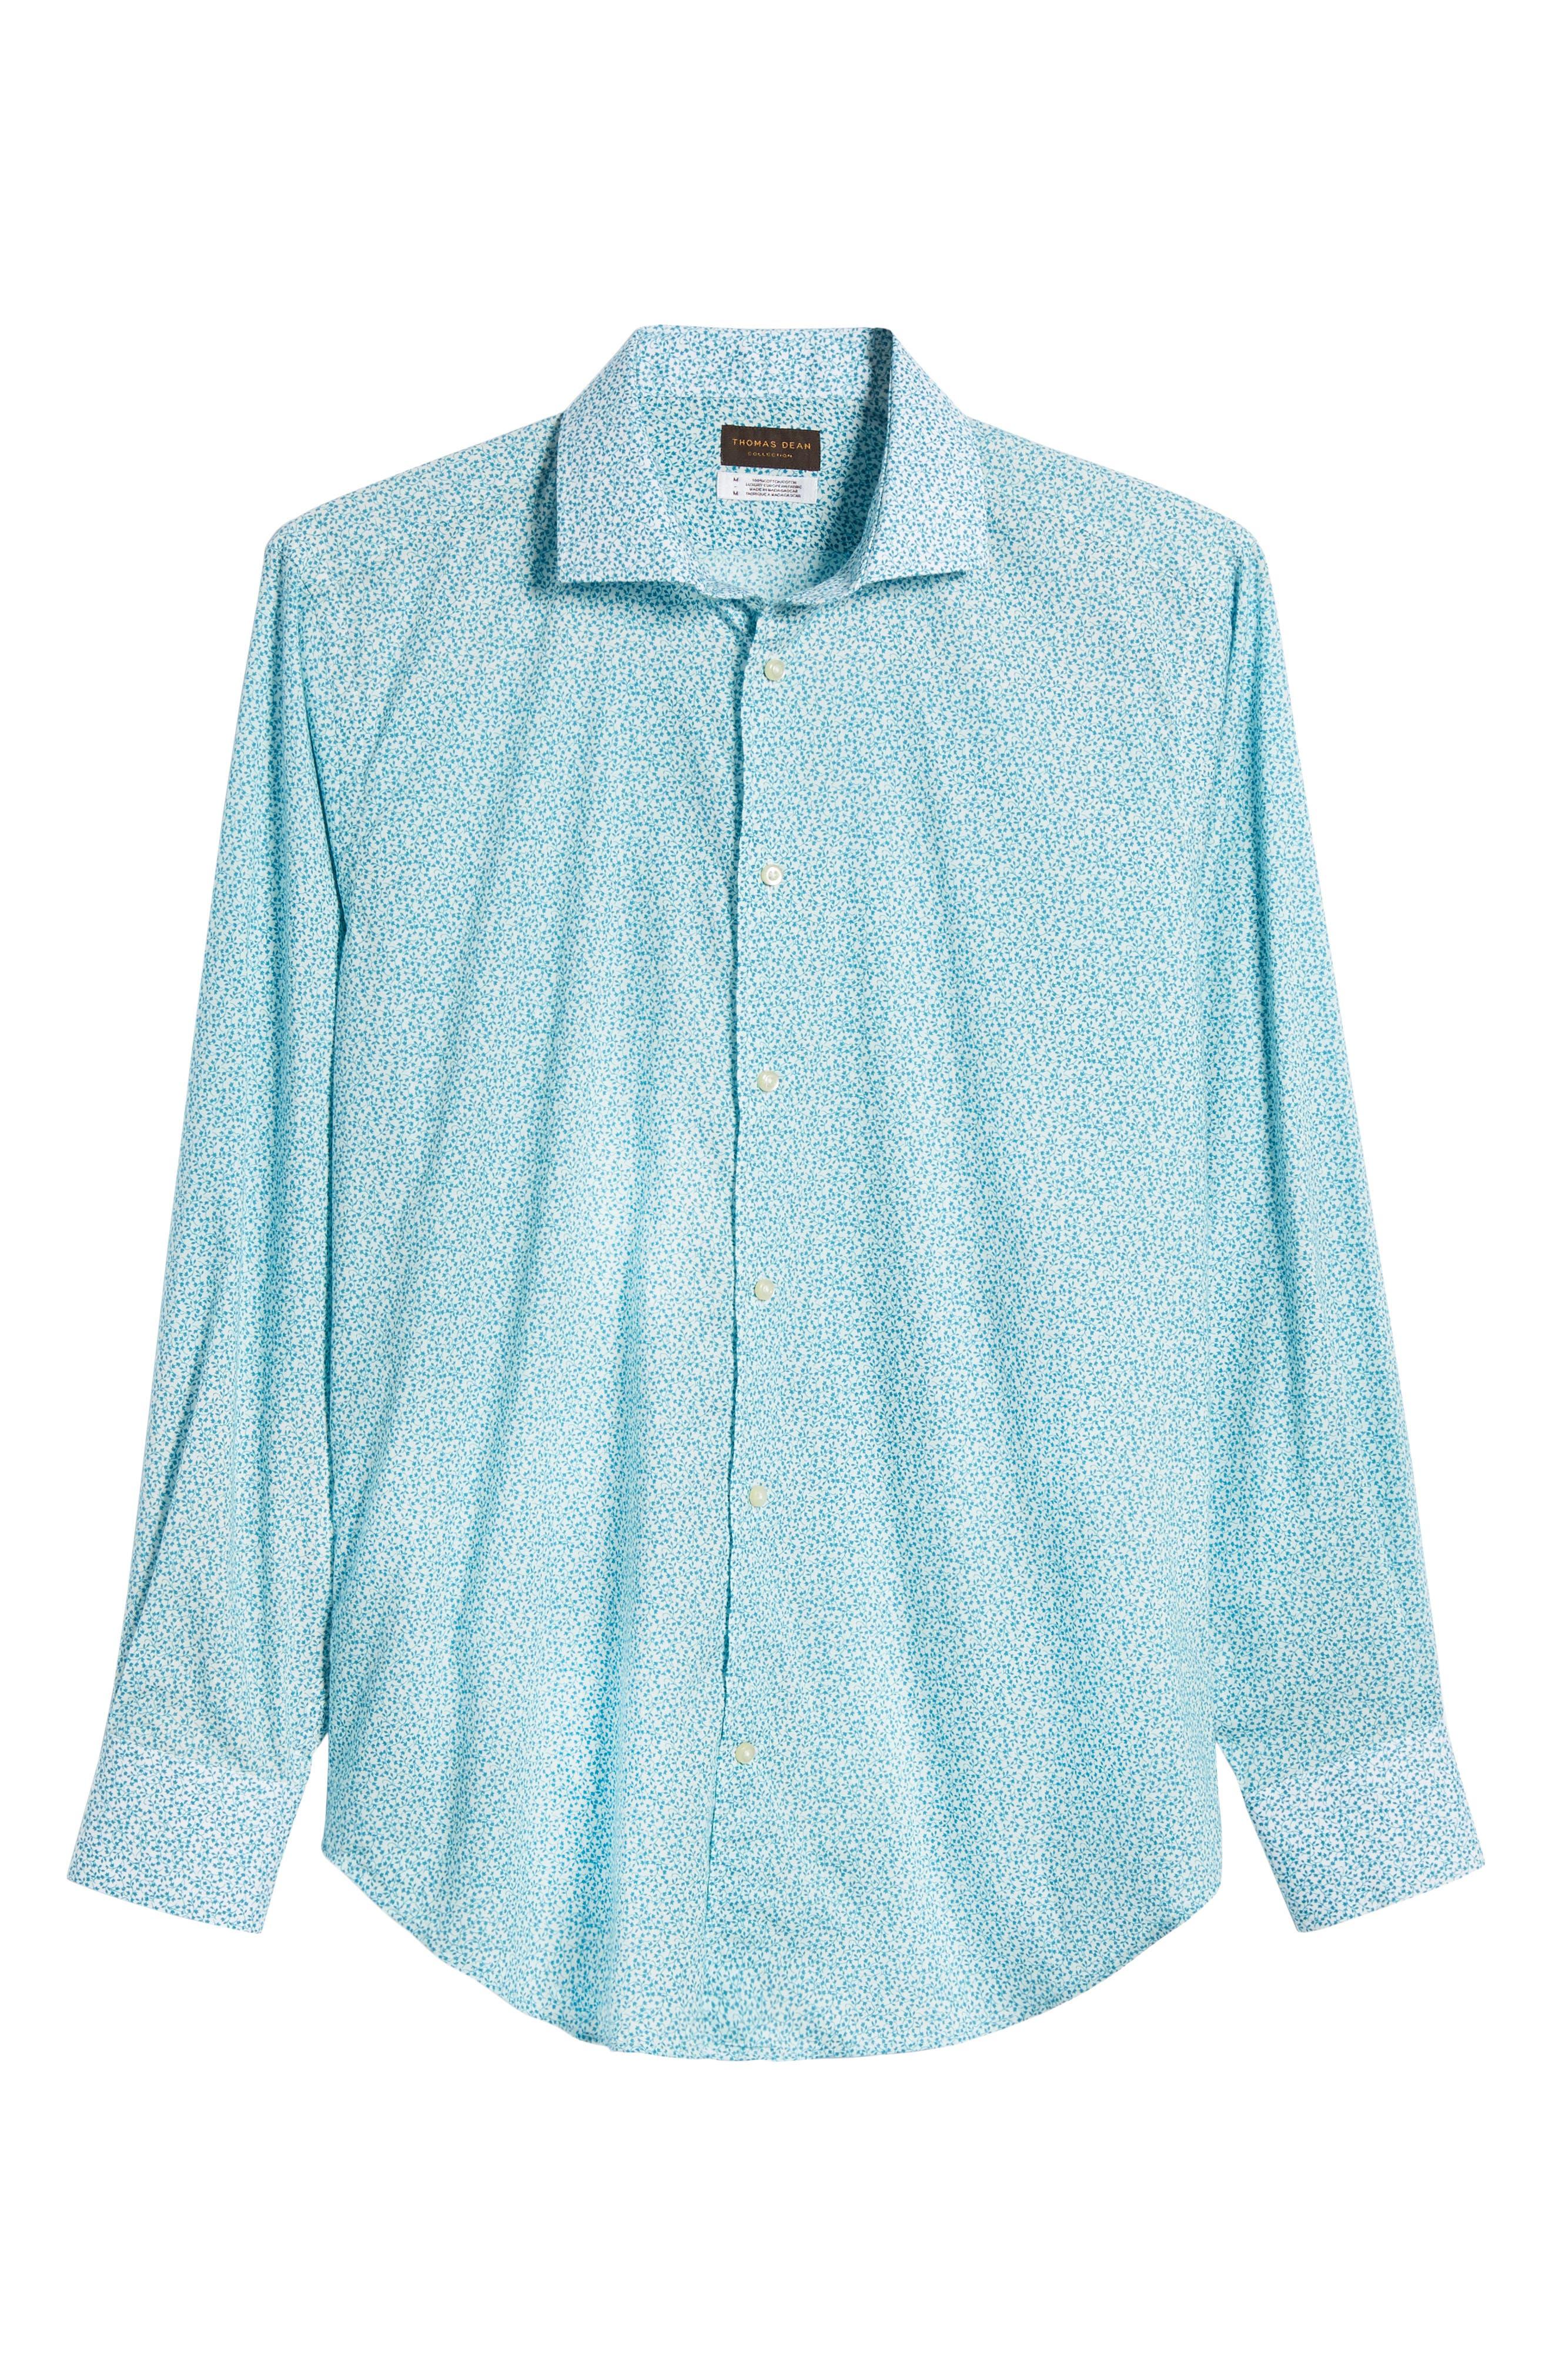 THOMAS DEAN,                             Regular Fit Floral Print Sport Shirt,                             Alternate thumbnail 6, color,                             300